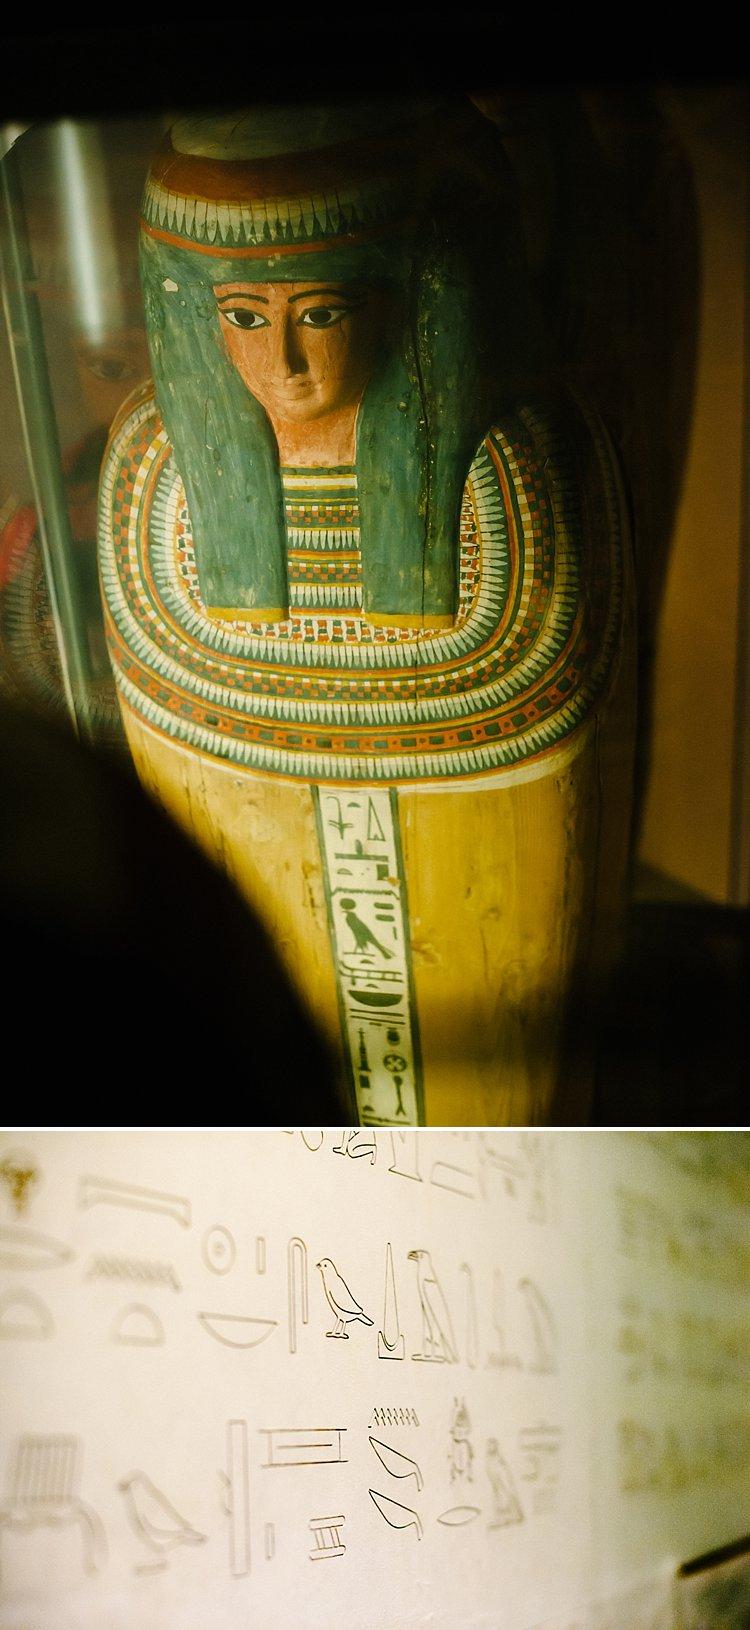 london-family-photographer-sawyer-sunday-exeter-ramm-egyptian-experience-lily-sawyer-photo